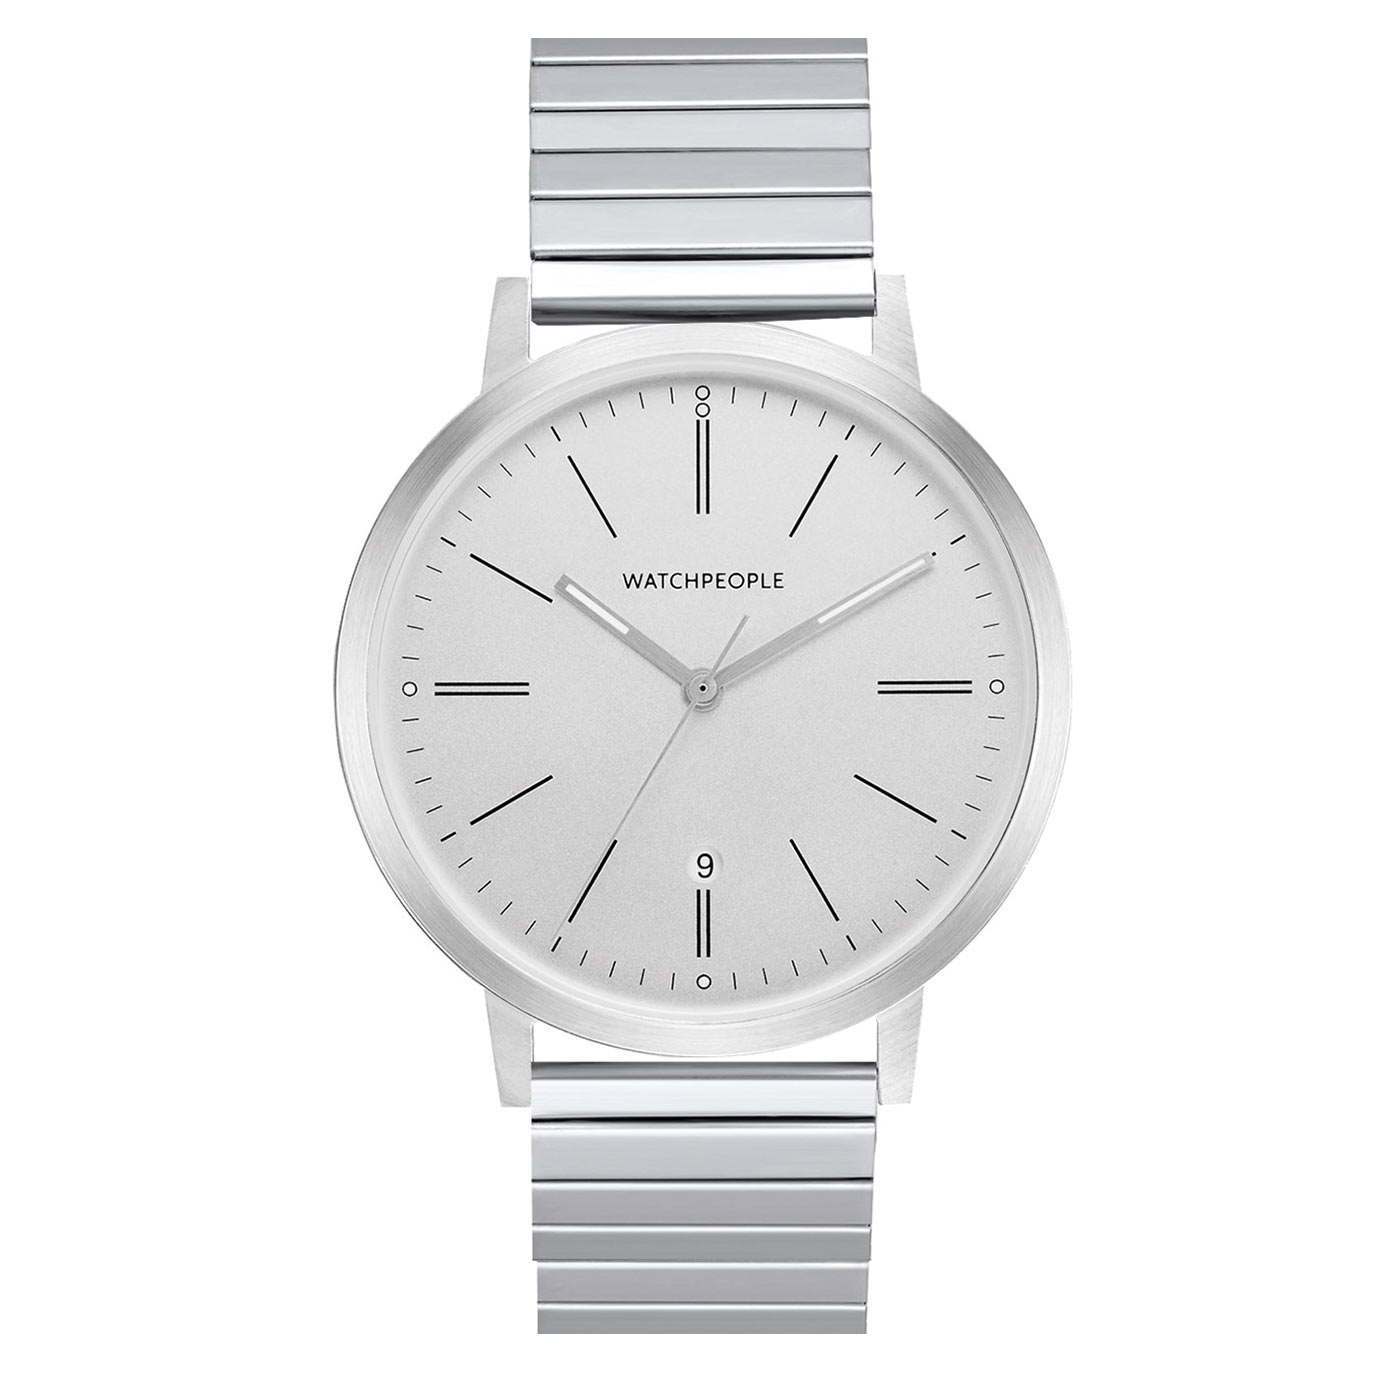 Watchpeople Herrenarmbanduhr Flex Collection